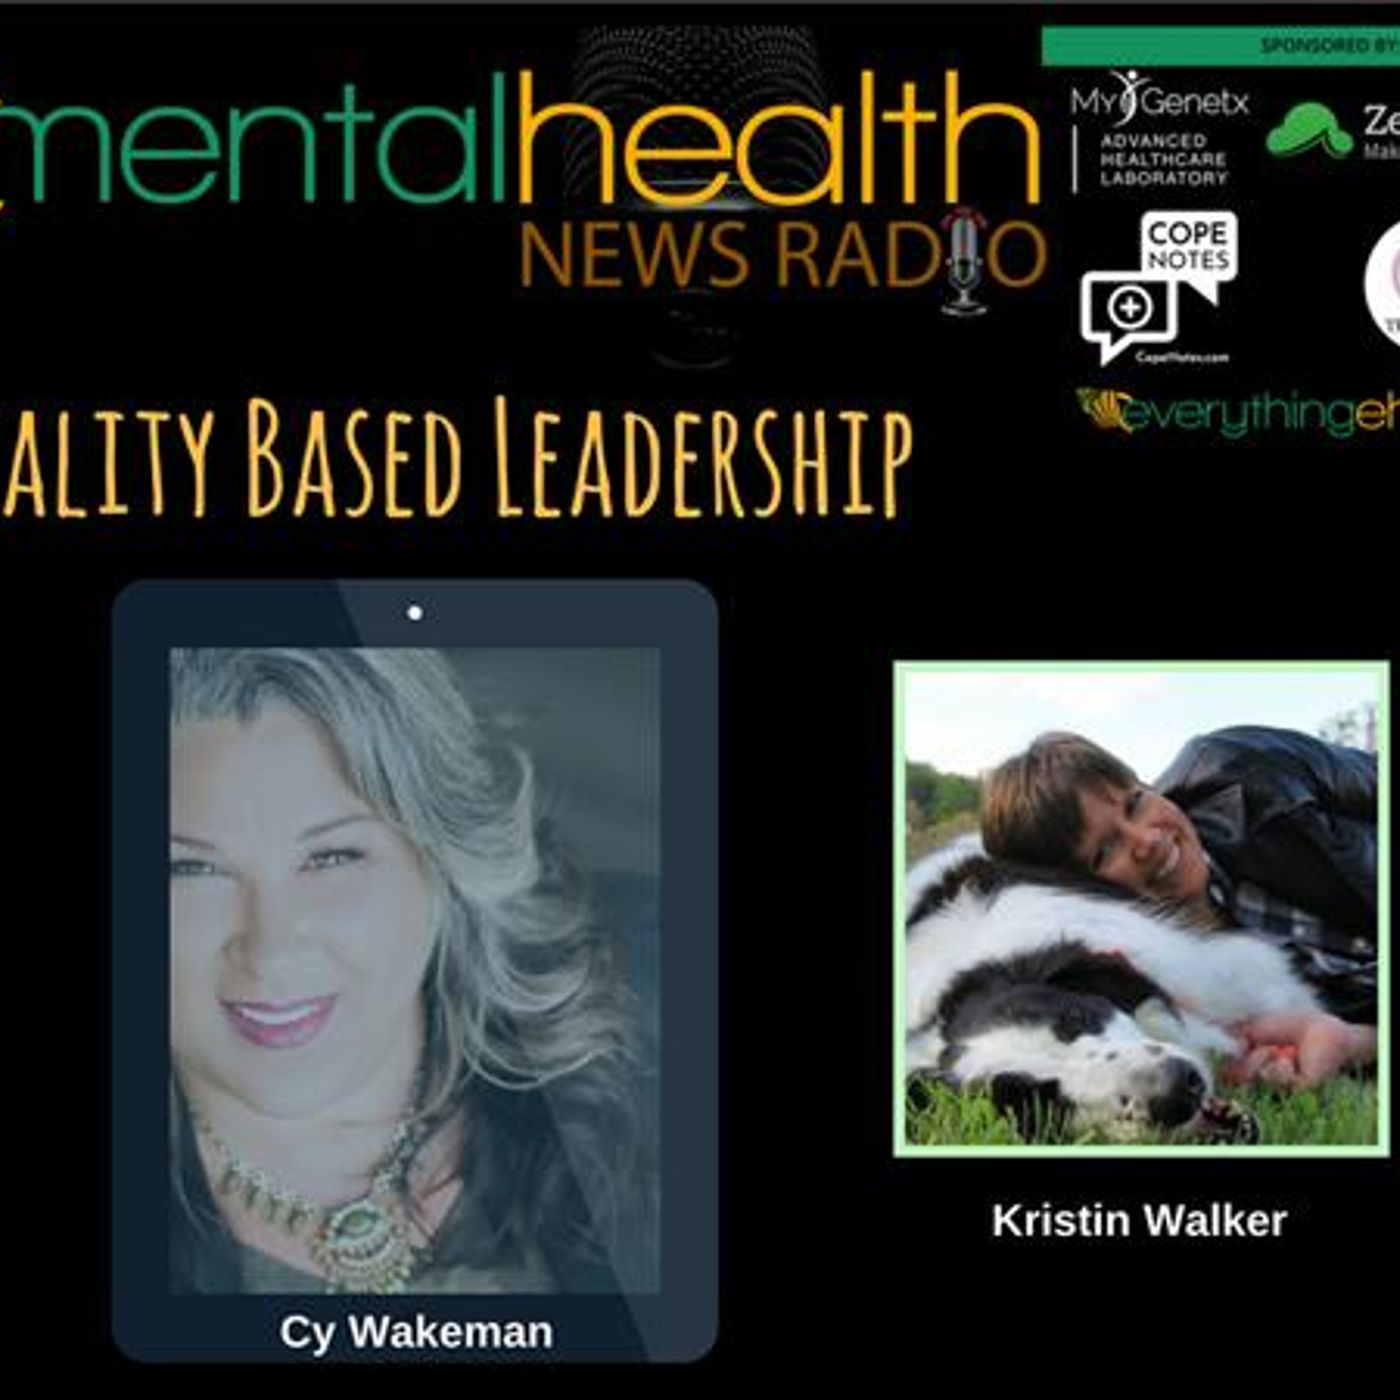 Mental Health News Radio - Reality Based Leadership According to Cy Wakeman